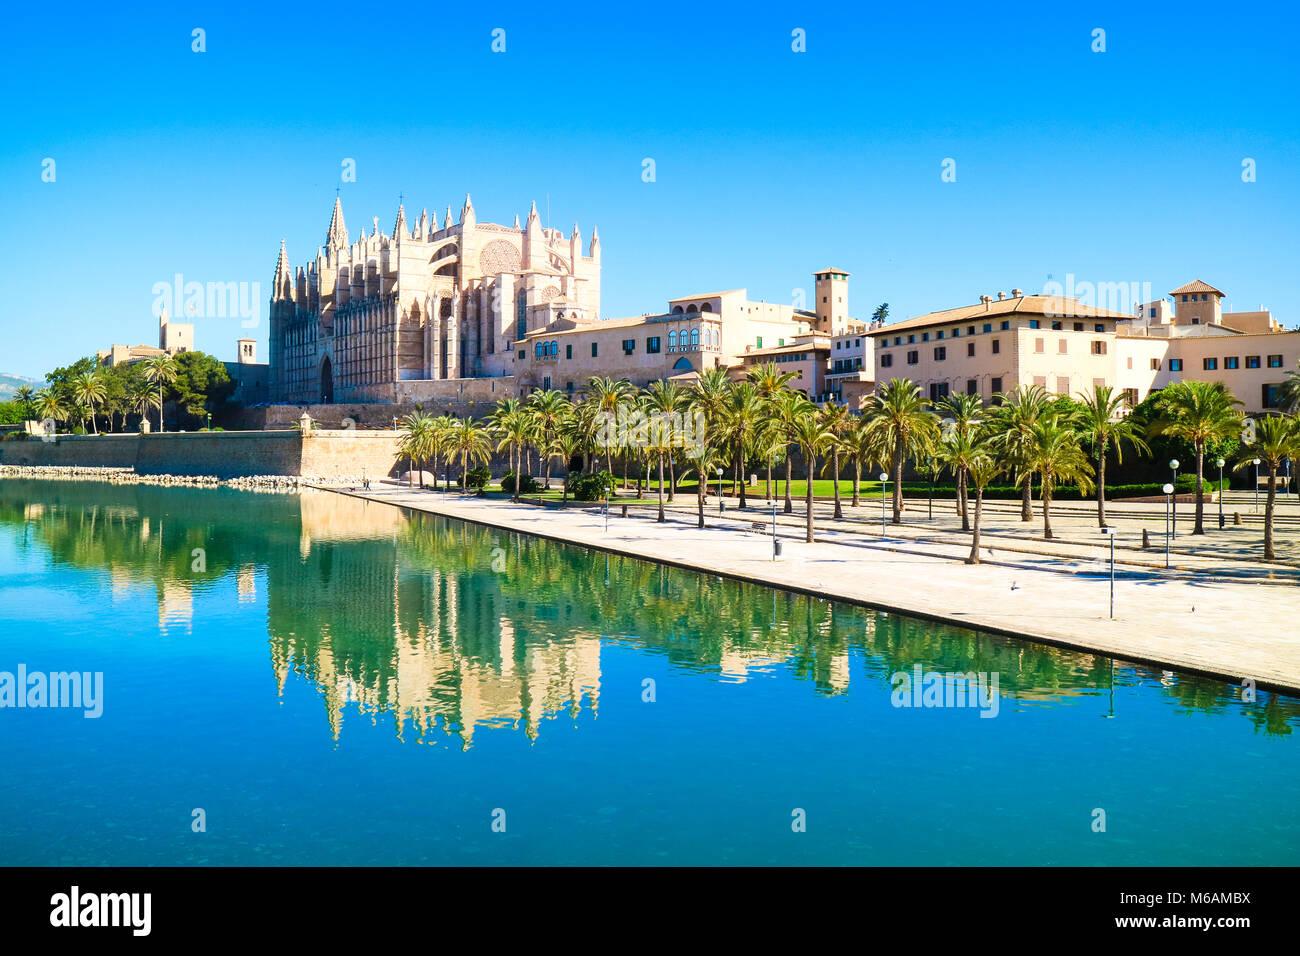 La Seu - the famous medieval gothic catholic cathedral. Palma de Mallorca, Spain. Water reflection. - Stock Image